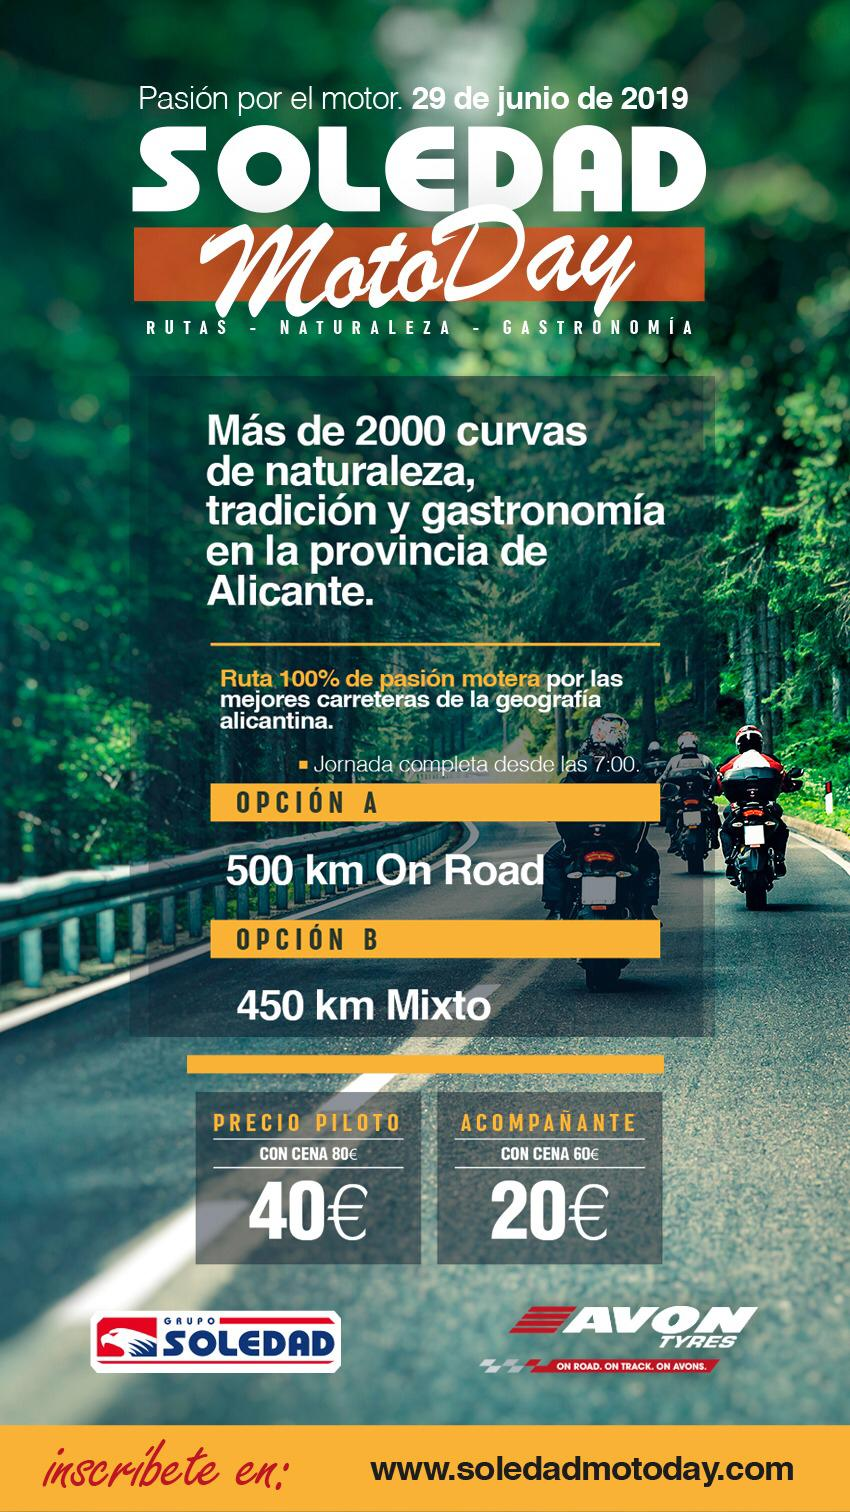 Ruta Soledad Moto Day